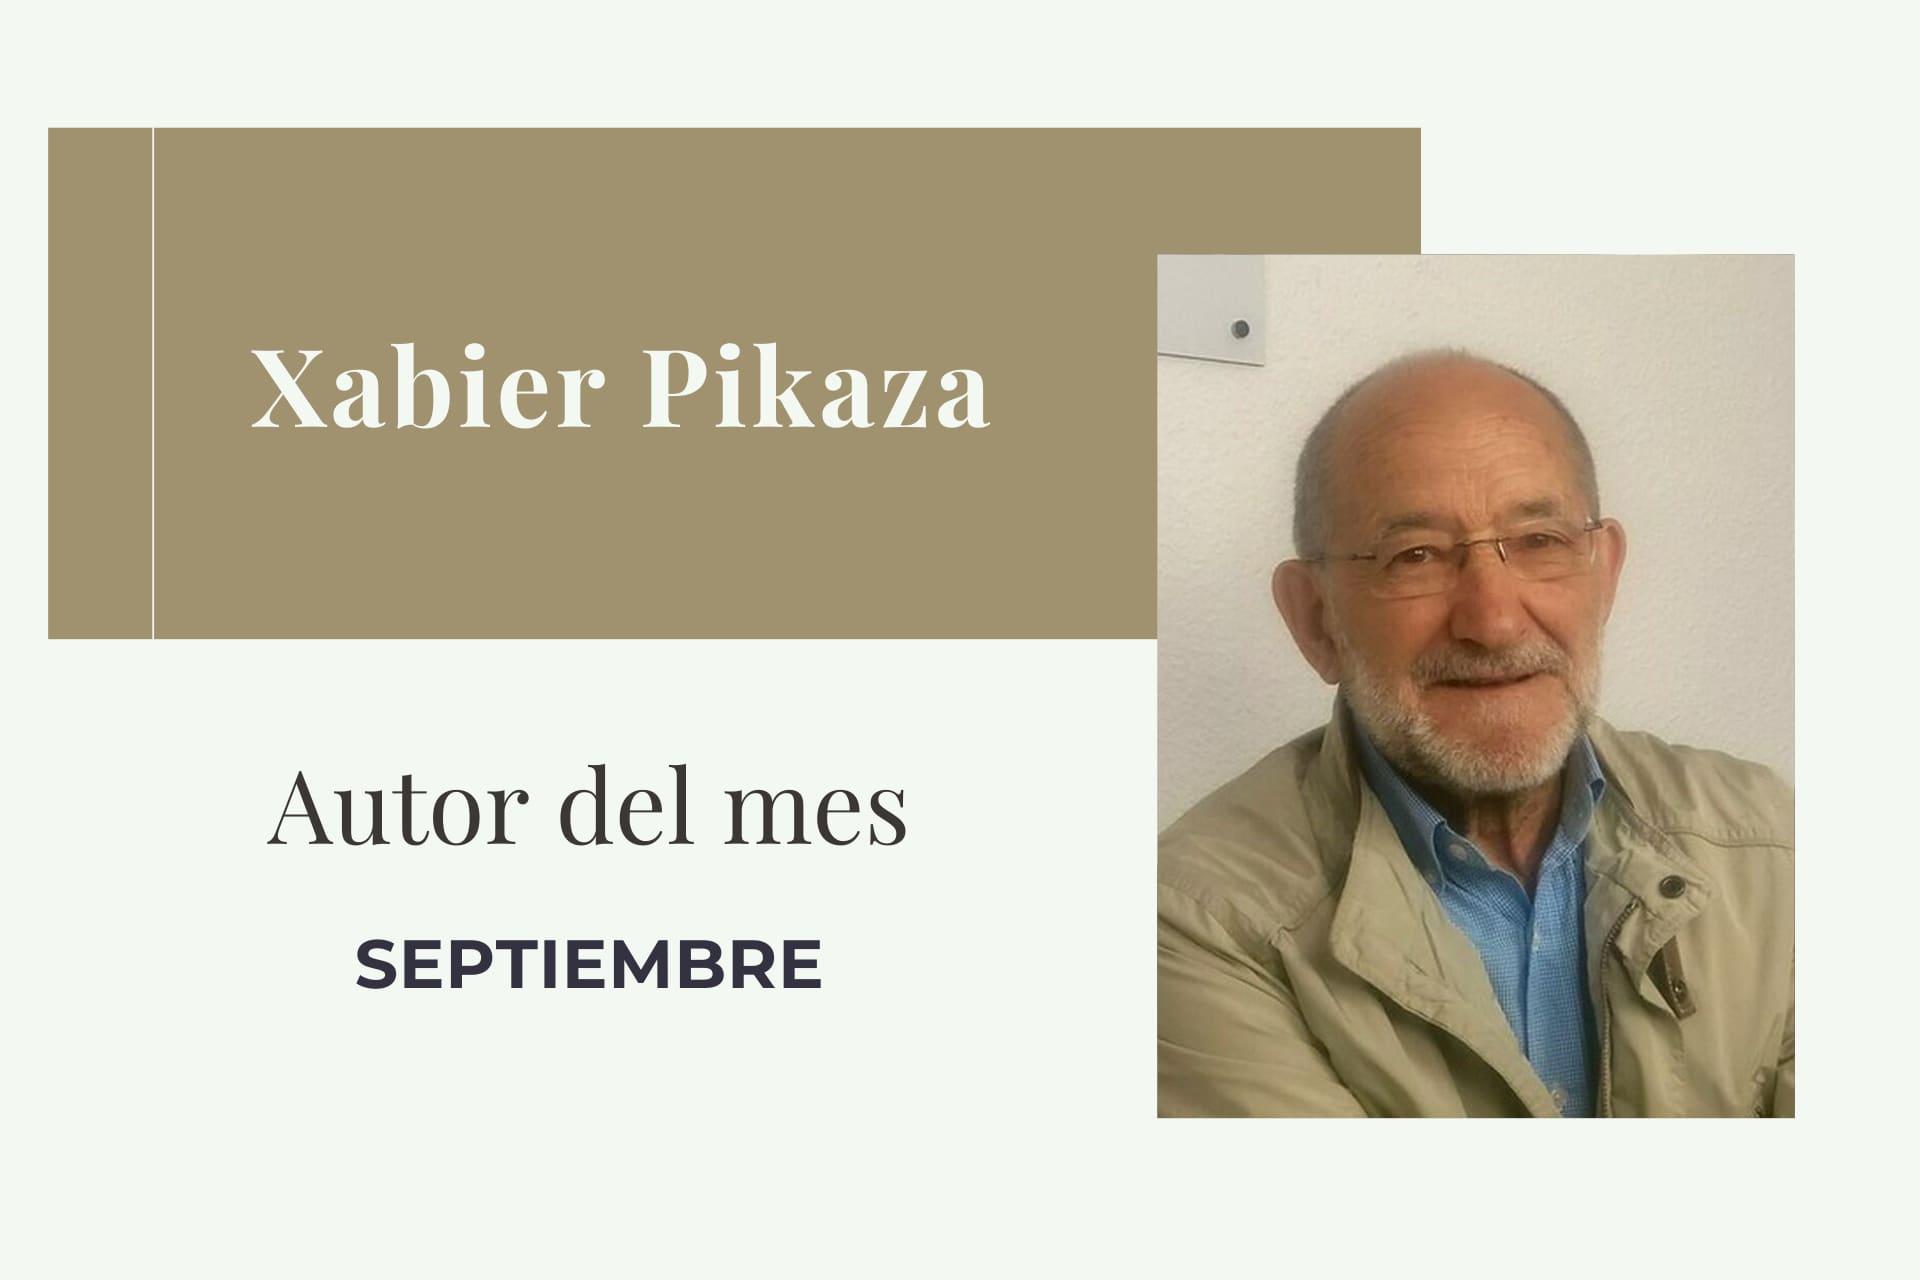 Xabier Pikaza